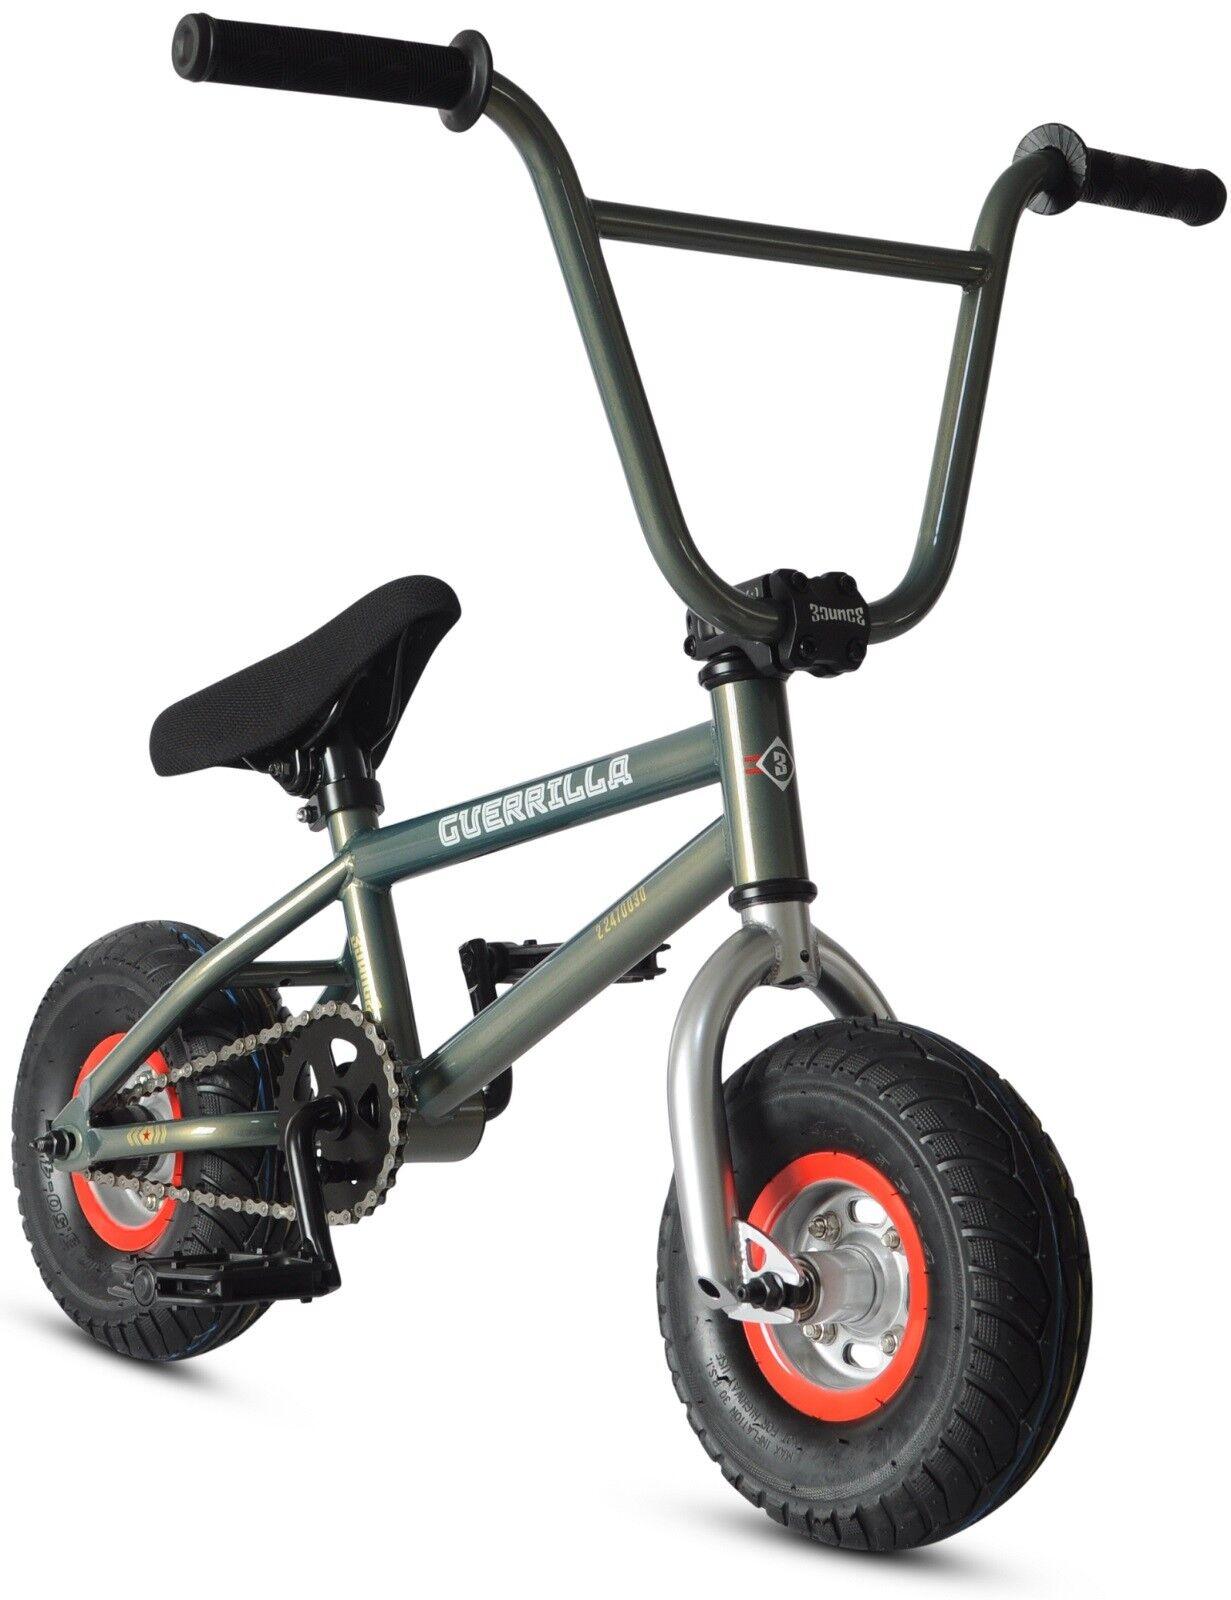 Bounce Guerrilla Mini 10  BMX Bicycle  Freestyle Stunt Bike 1 PC Cranks Fat Tire  wholesale price